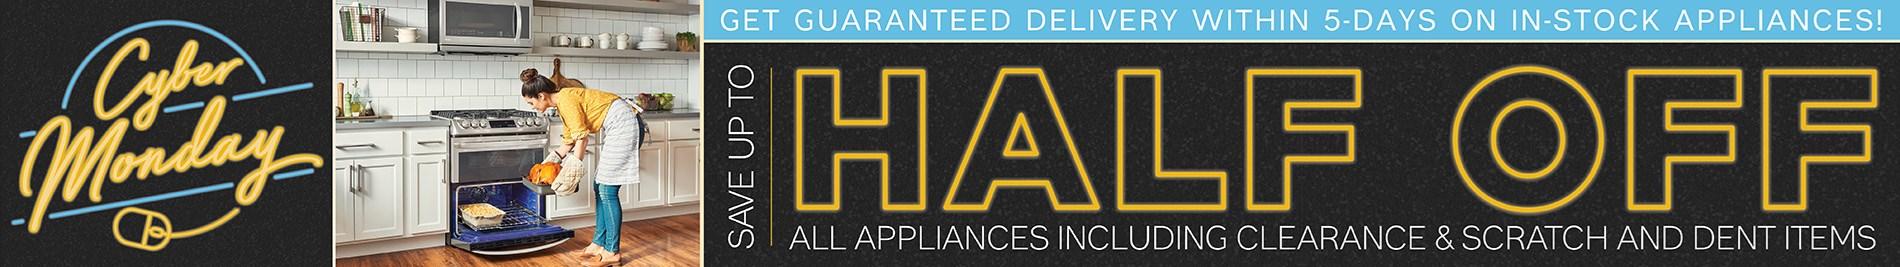 Furnitur & ApplianceMart Cyber Monday Sale